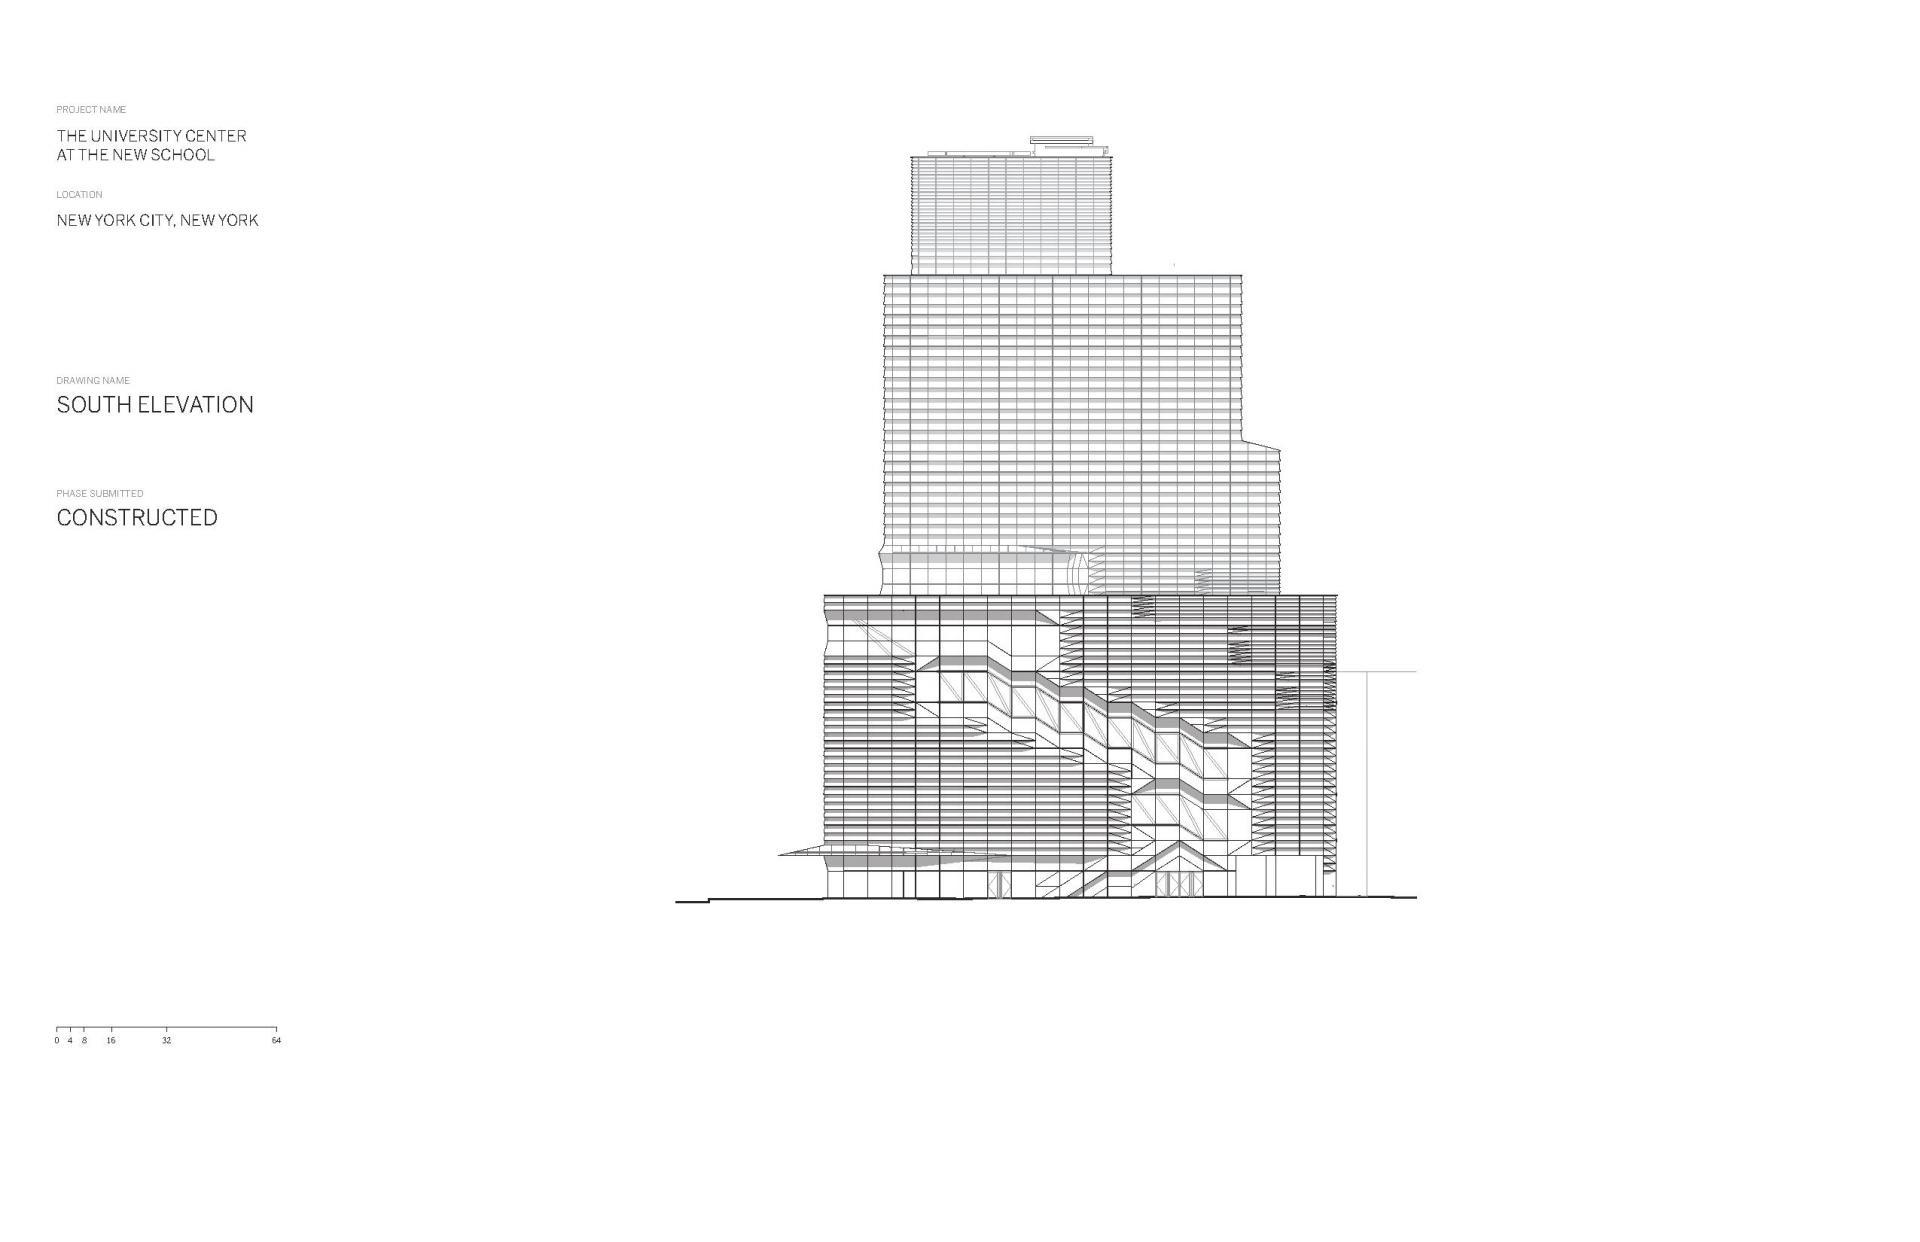 Схема учебного центра Greenwich Village в Нью Йорке - Фото 12